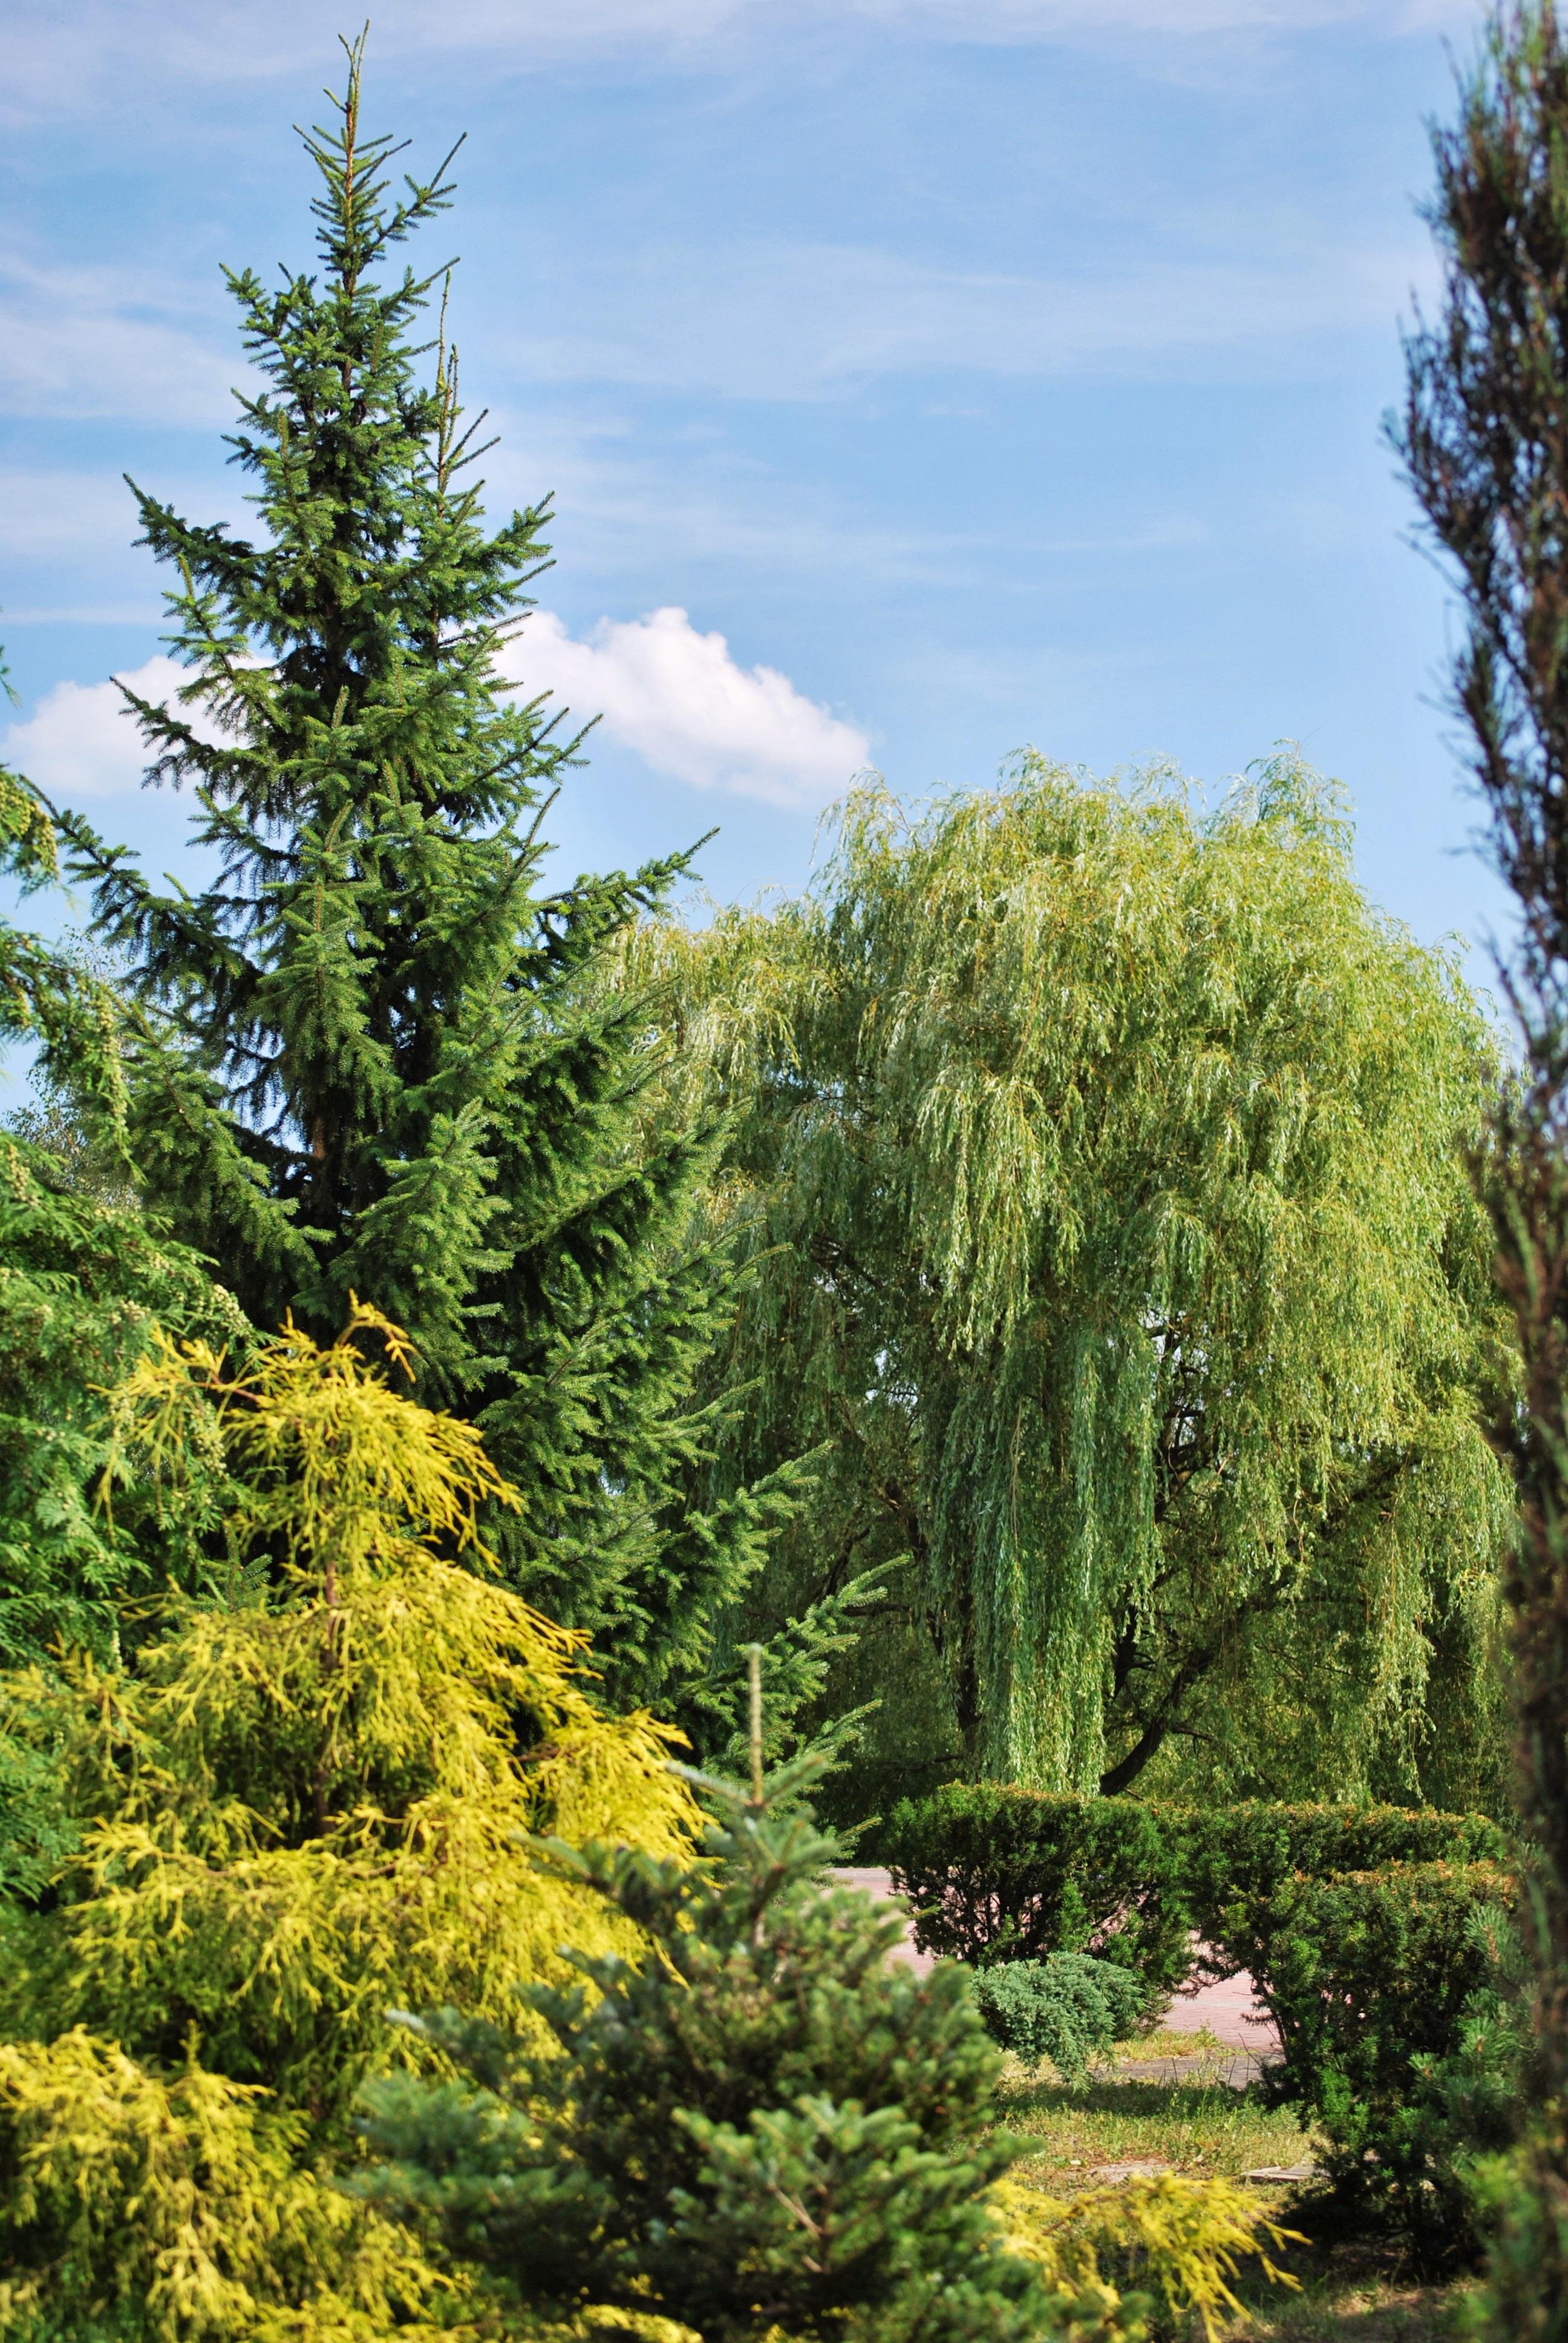 Fotos gratis rbol naturaleza bosque rama planta for Carson bosque y jardin